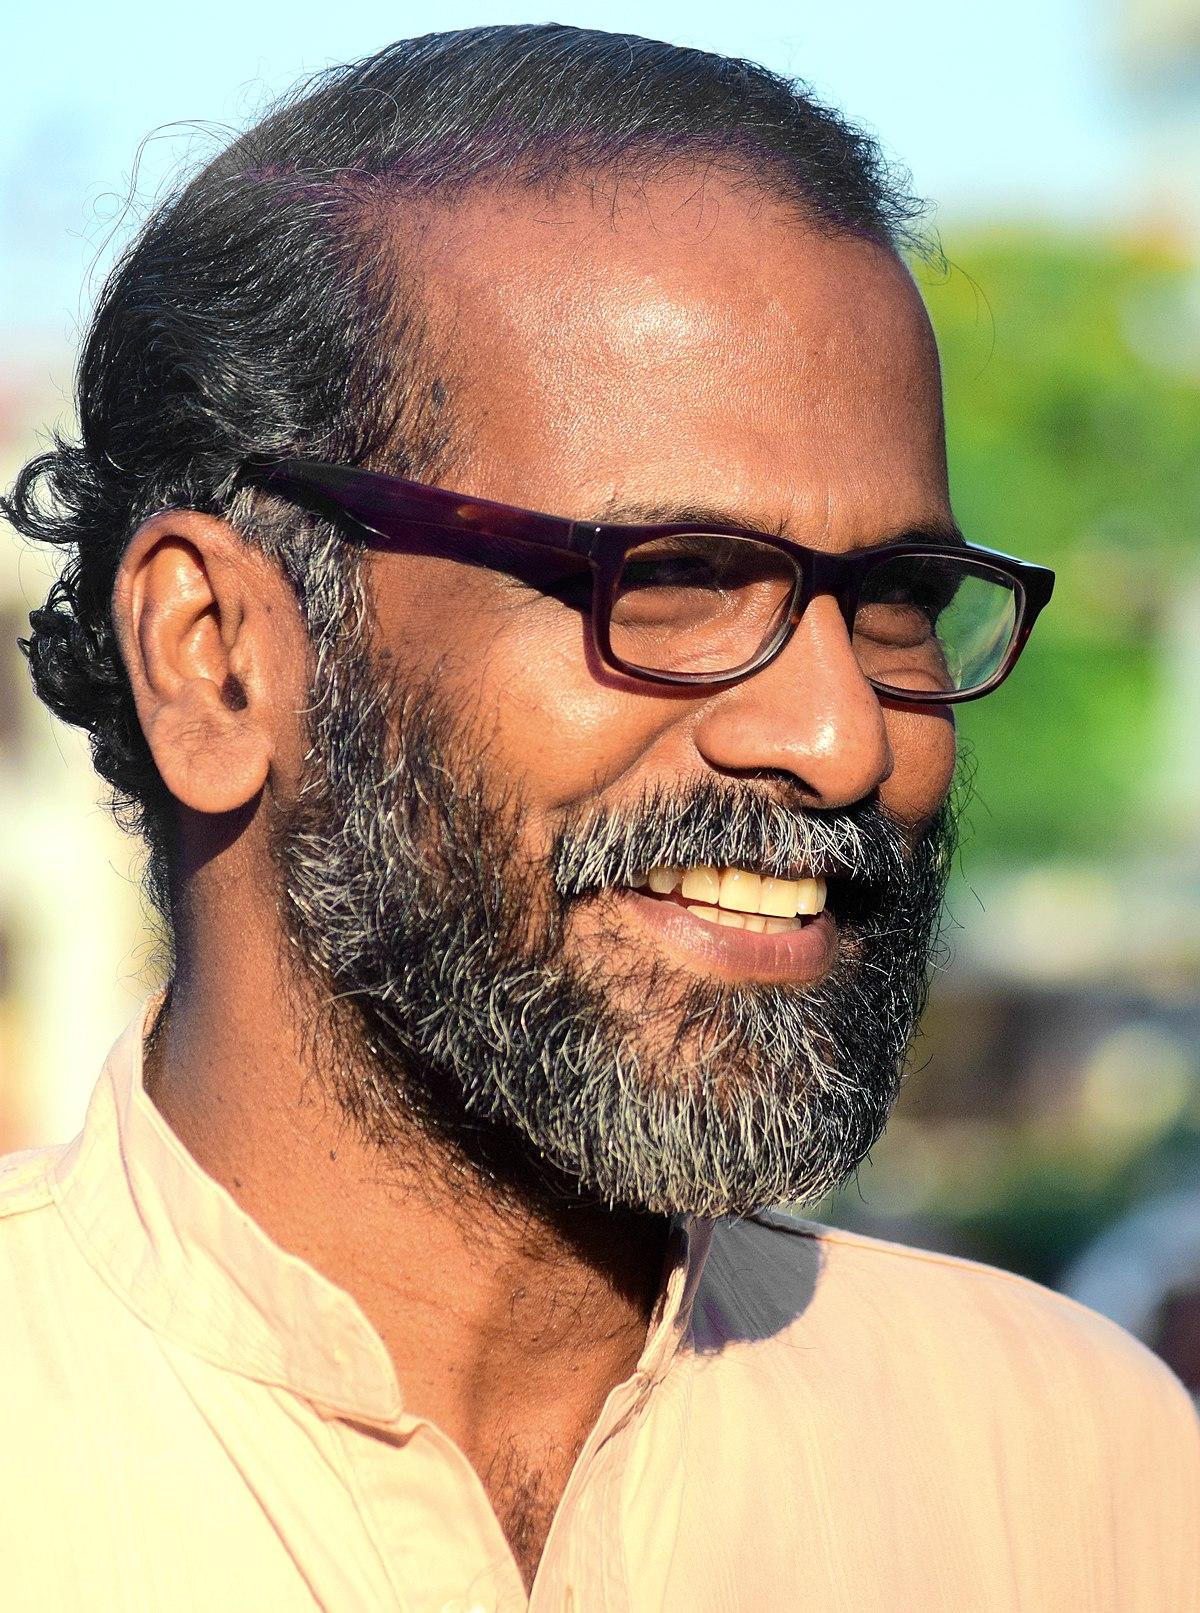 Sunil P. Ilayidom